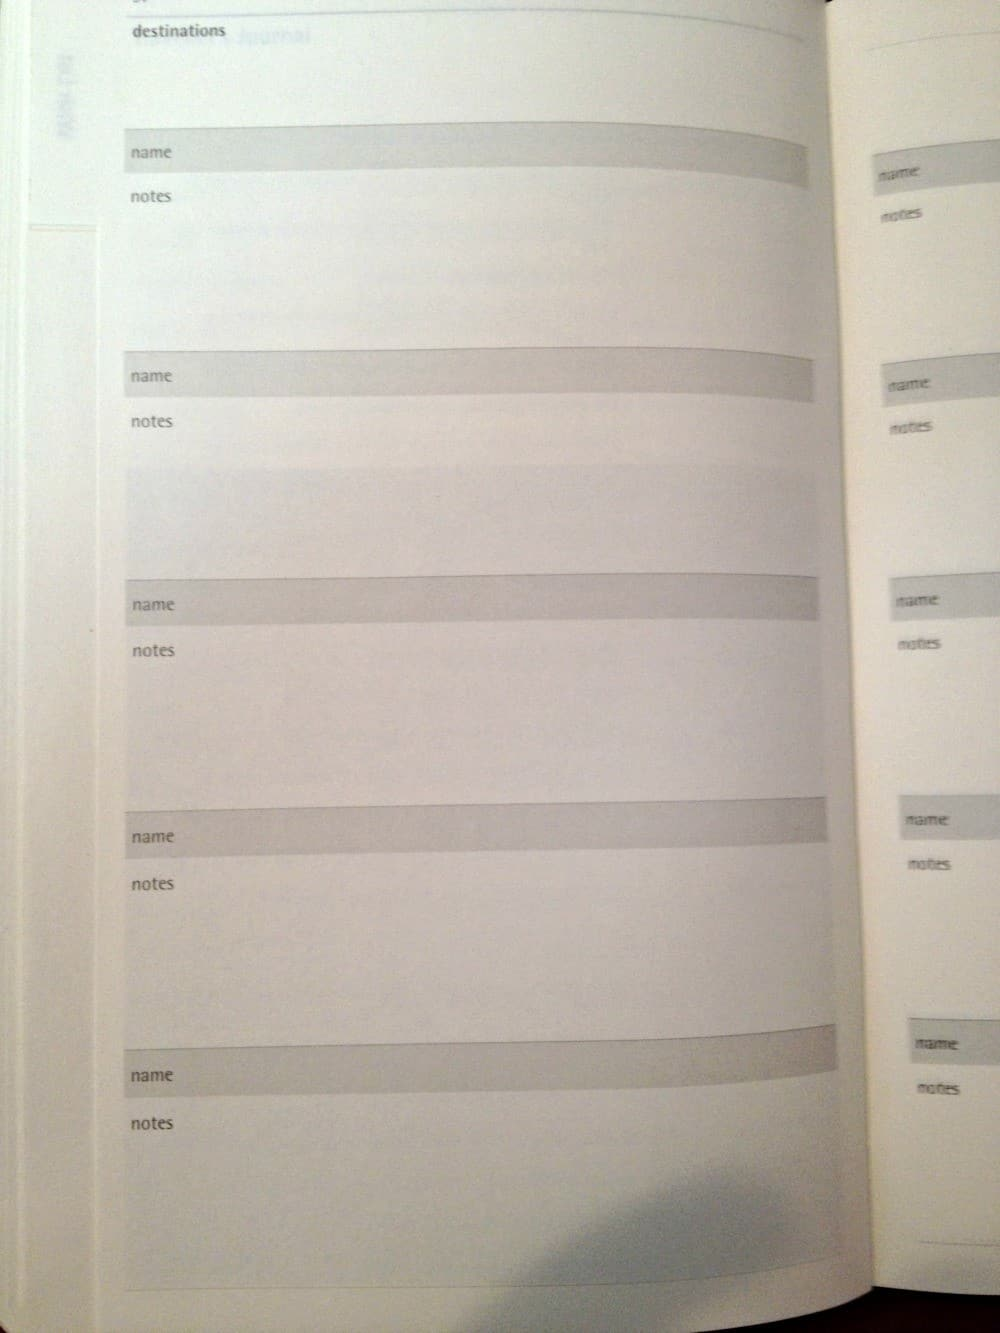 Moleskine Travel Journal sec 2 tab 1